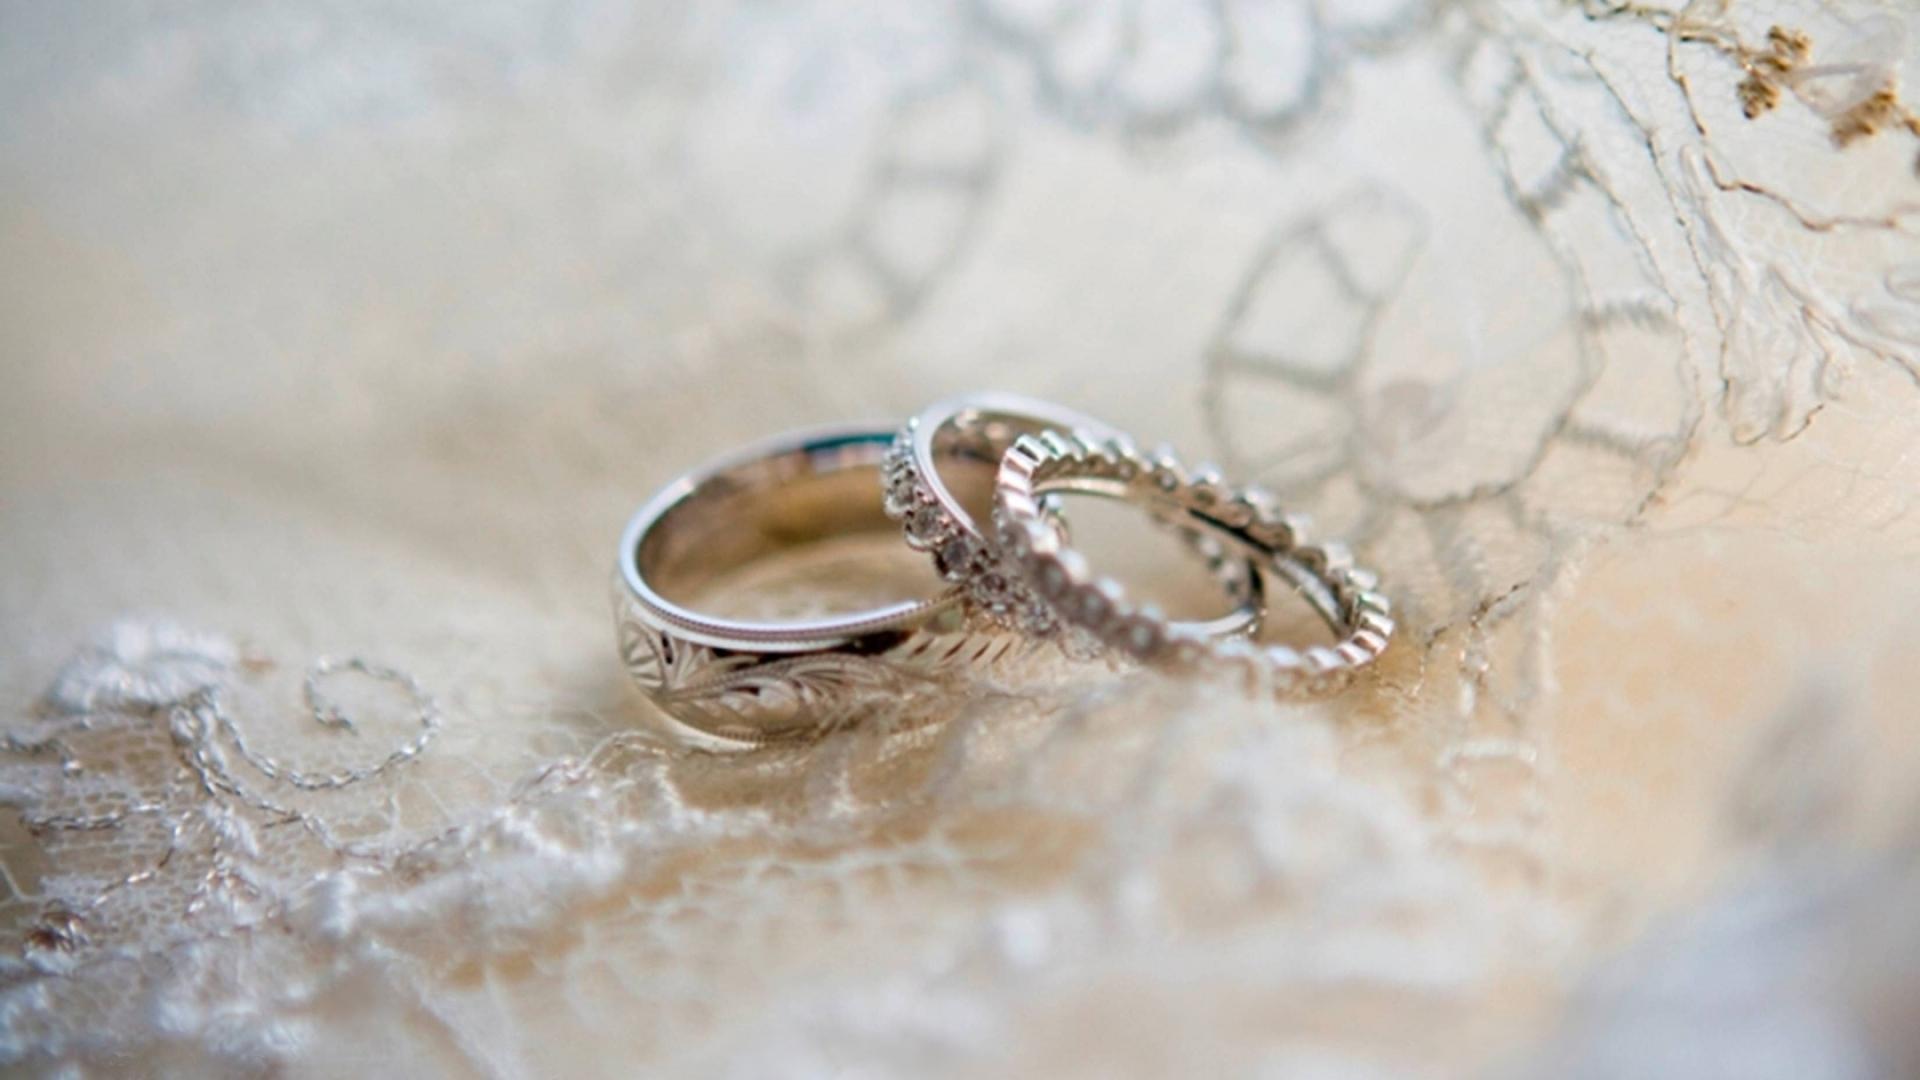 Download Wallpaper 1920x1080 Rings, Wedding, Love. Vampire Rings. Industrial Rings. Traditional Celtic Wedding Engagement Rings. Outside Wedding Rings. Comfort Fit Wedding Rings. Solid Wood Wedding Rings. Modest Celebrity Rings. 2ct Rings